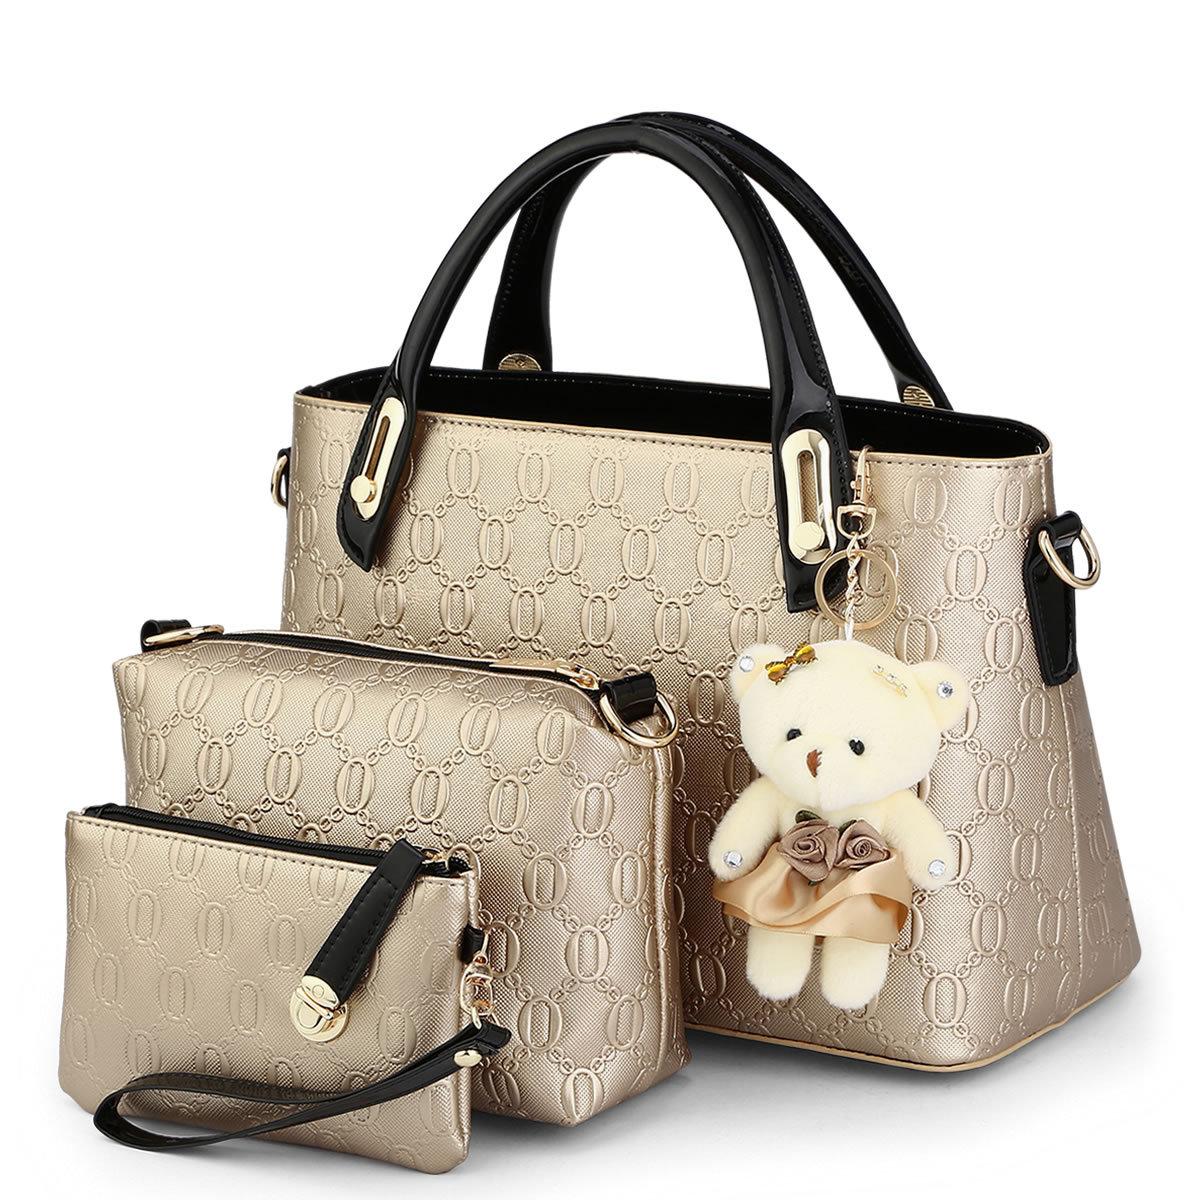 3 bags/set W/bear toy casual Embossed designer Fashion handbags high quality women messenger bags American Style shoulder bag Q5